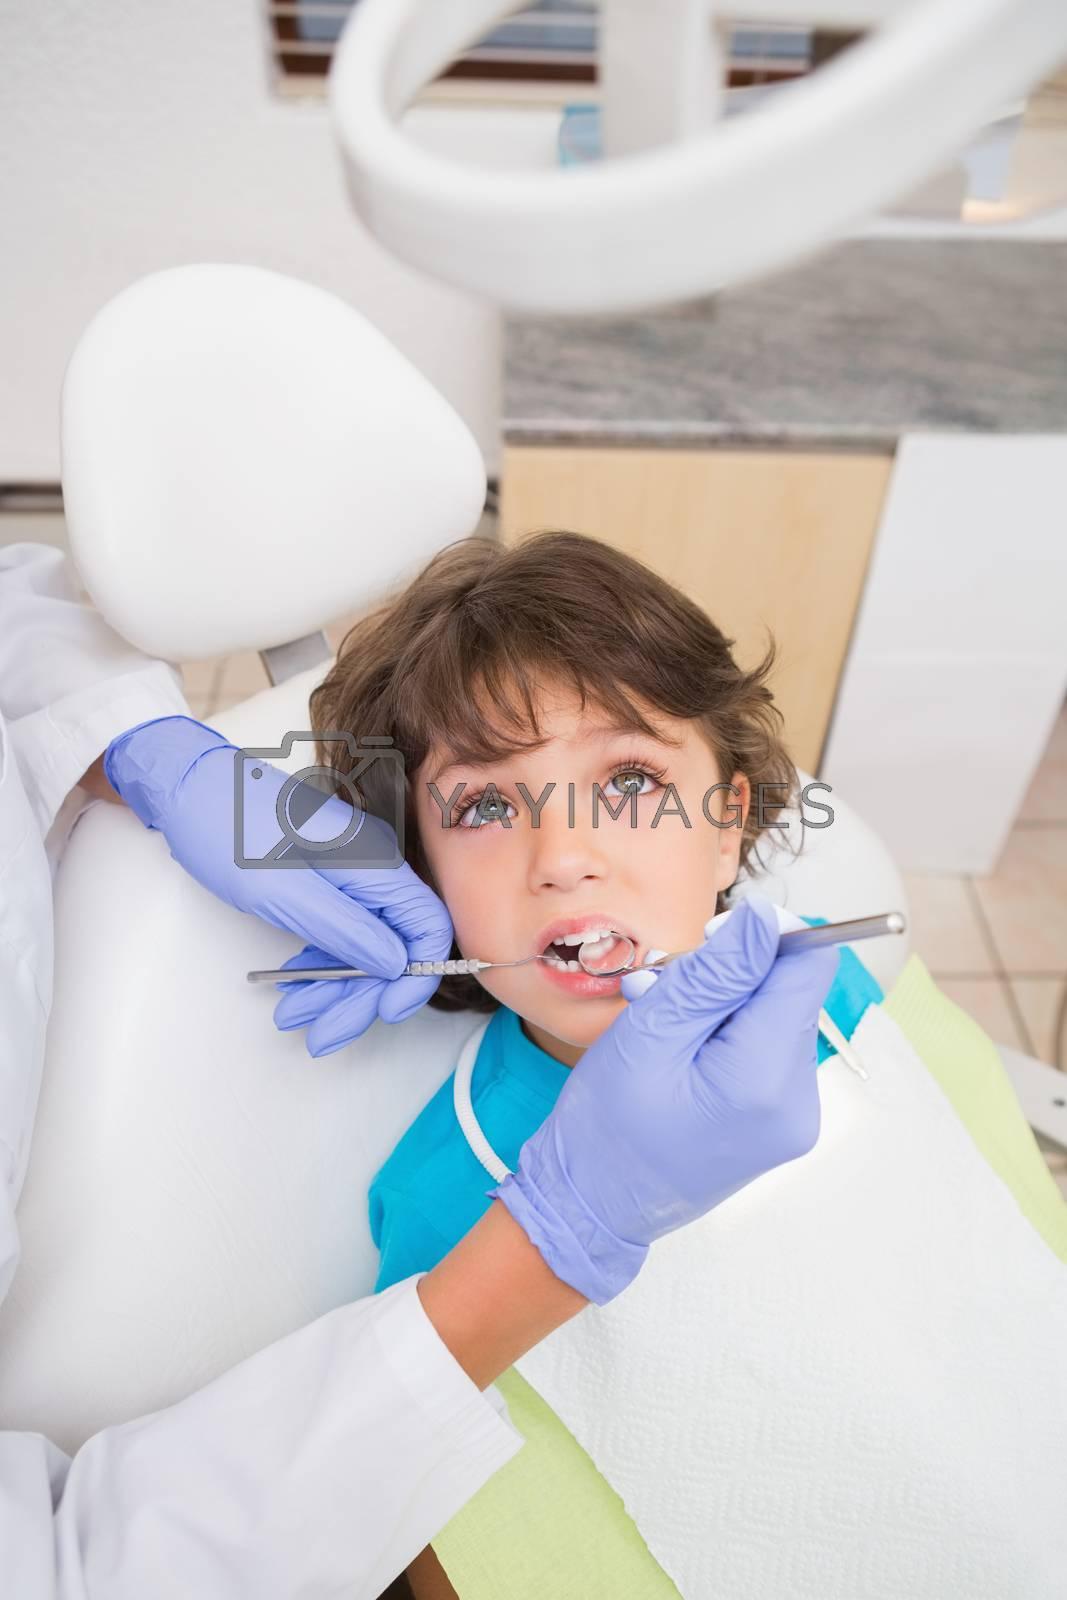 Pediatric dentist examining a little boys teeth in the dentists chair at the dental clinic